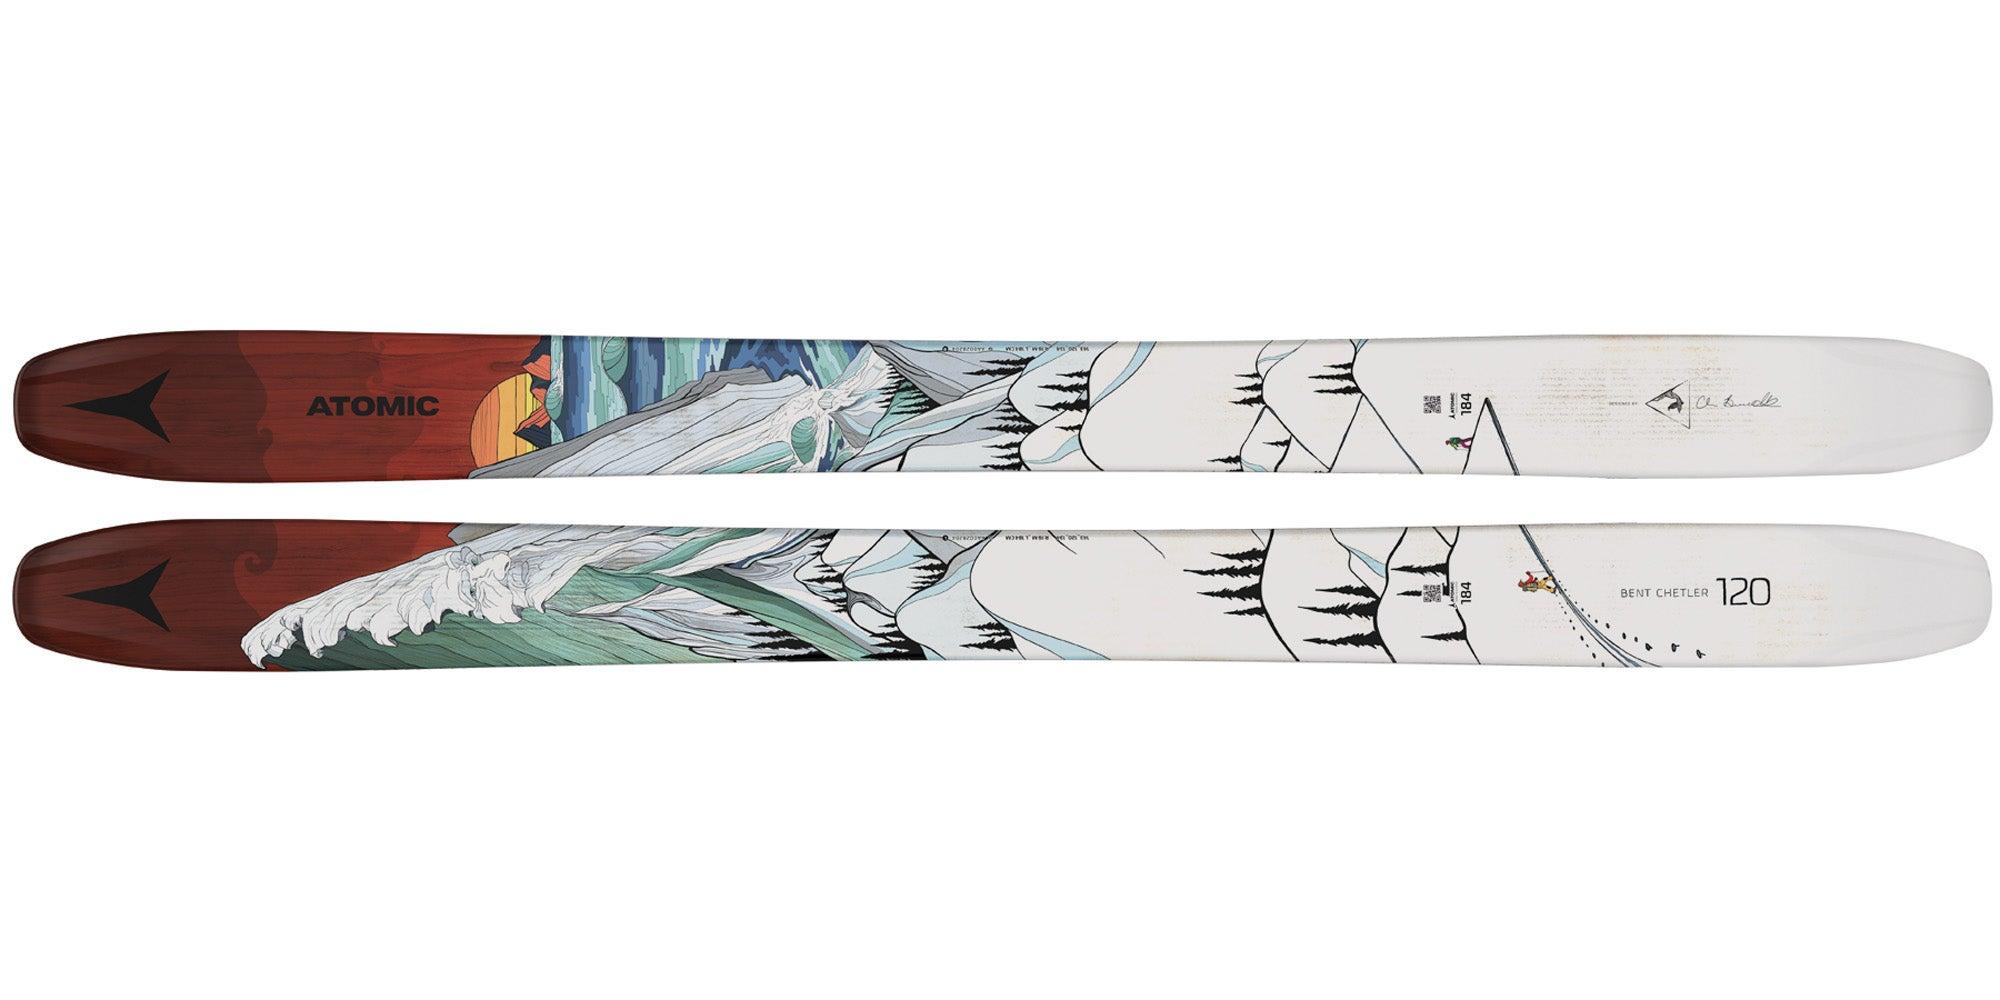 2021 Atomic Bent Chetler 120 men's deep snow ski